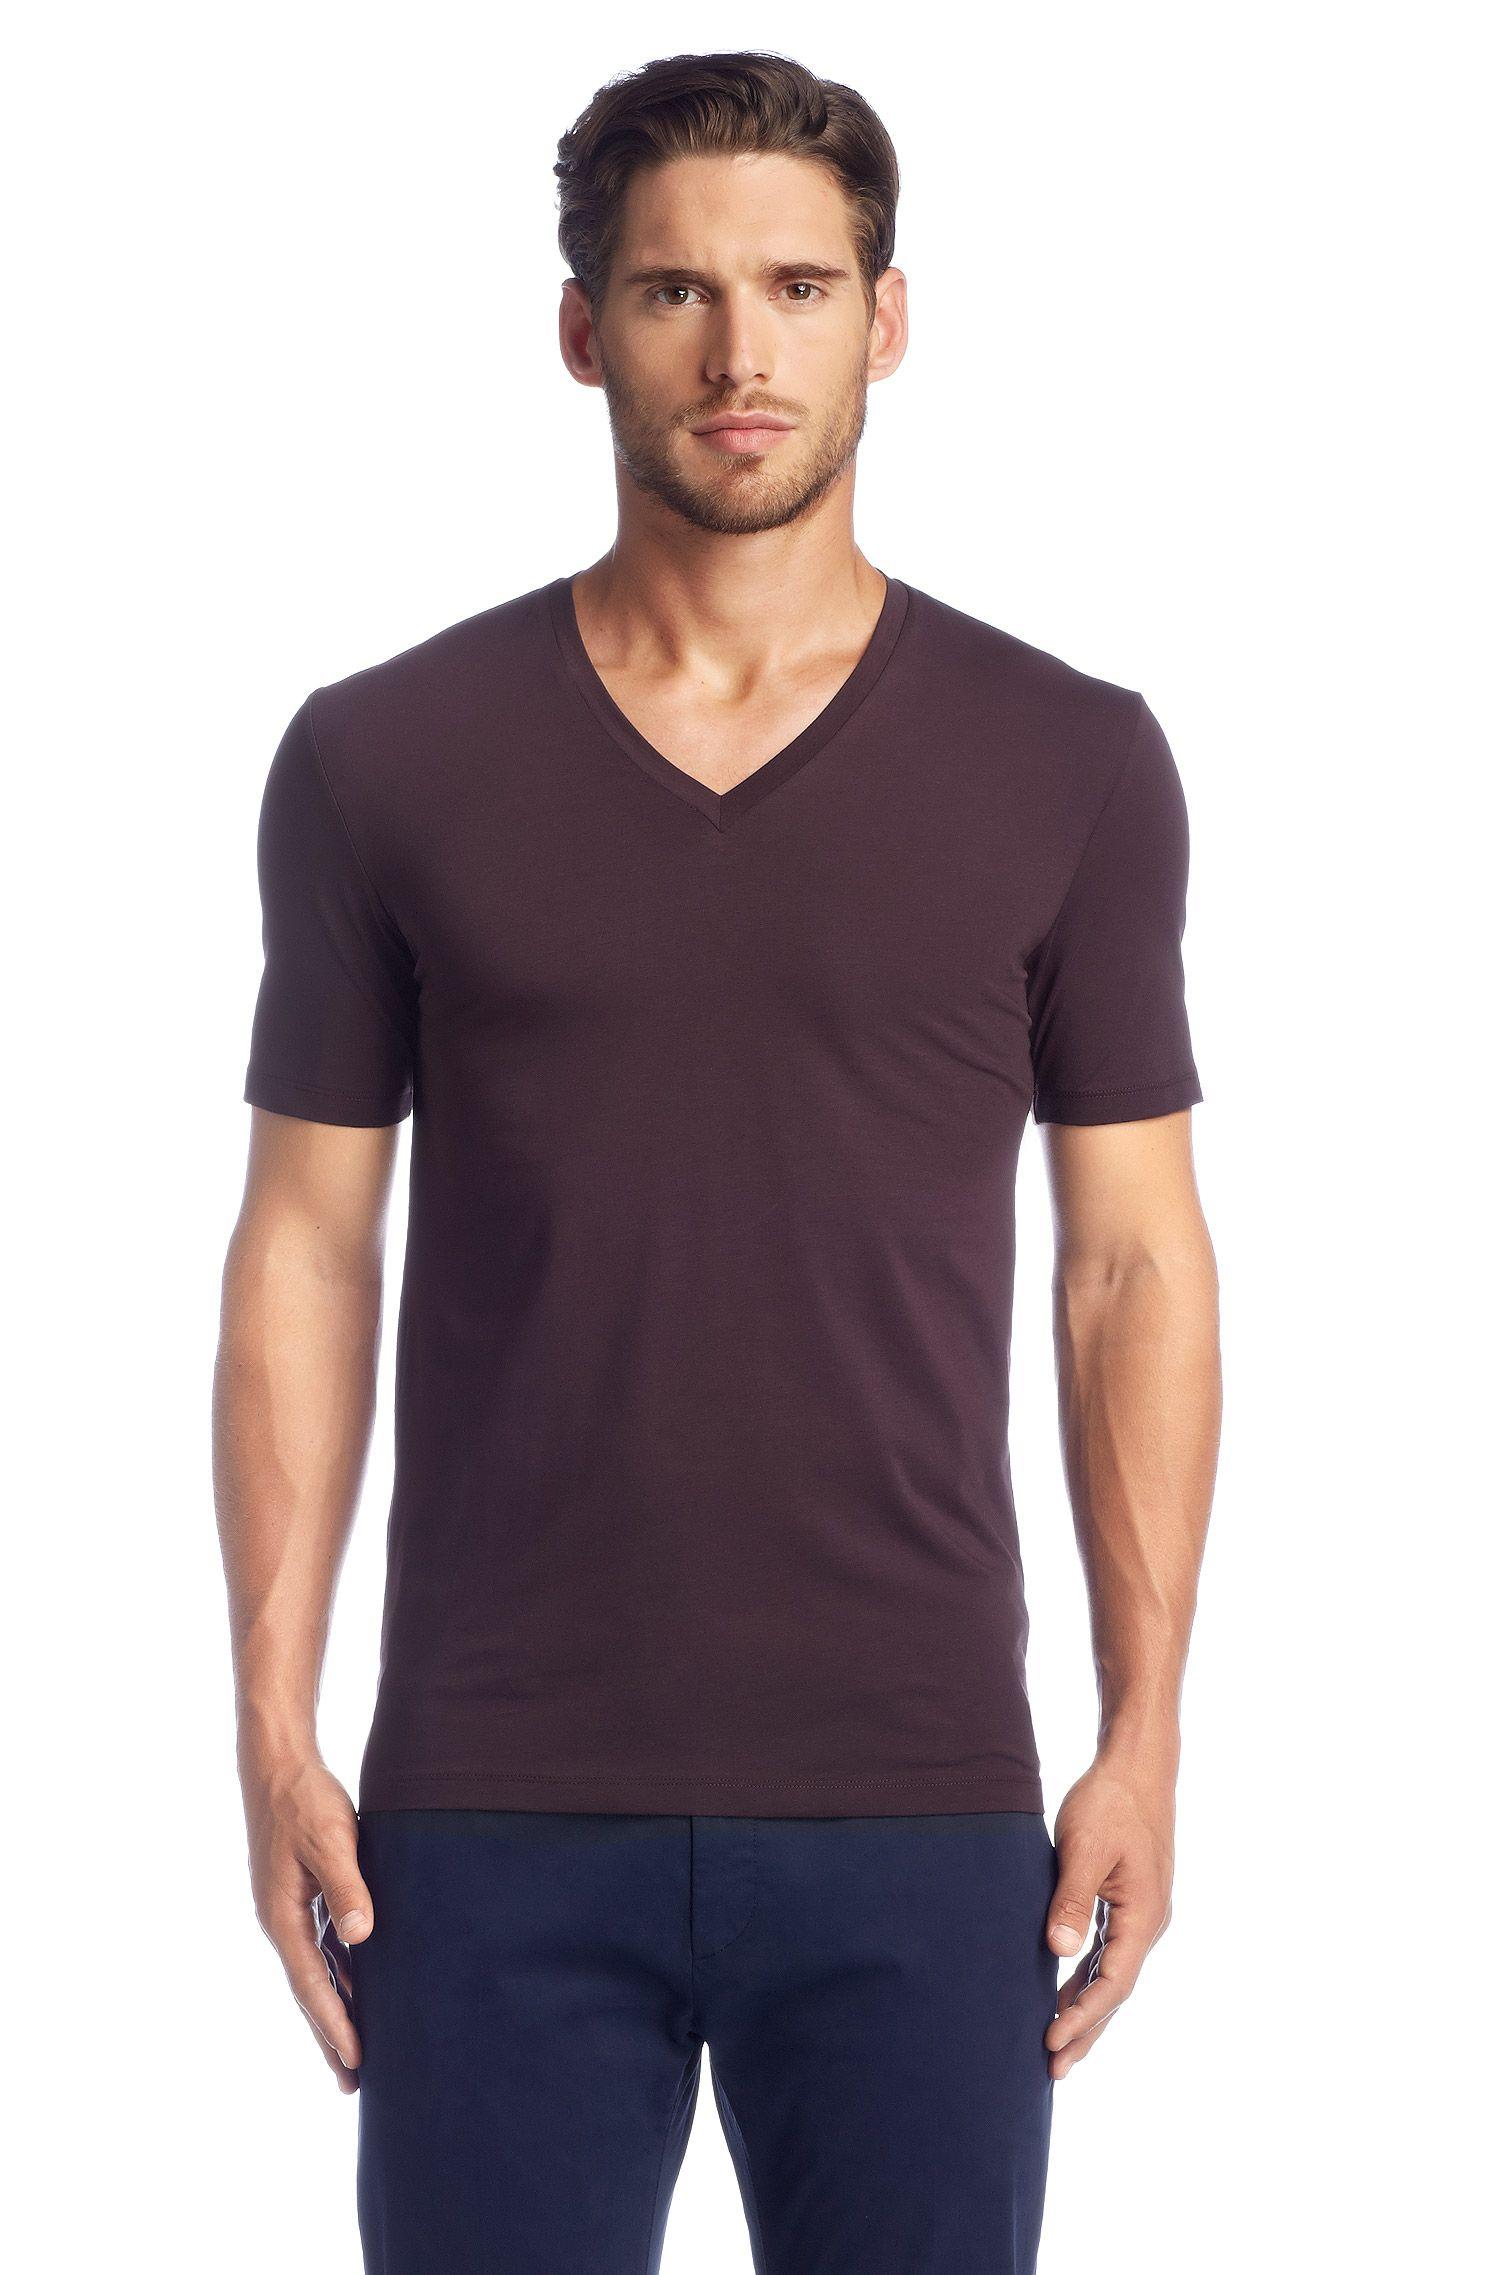 T-shirt à encolure en V, Dredoso